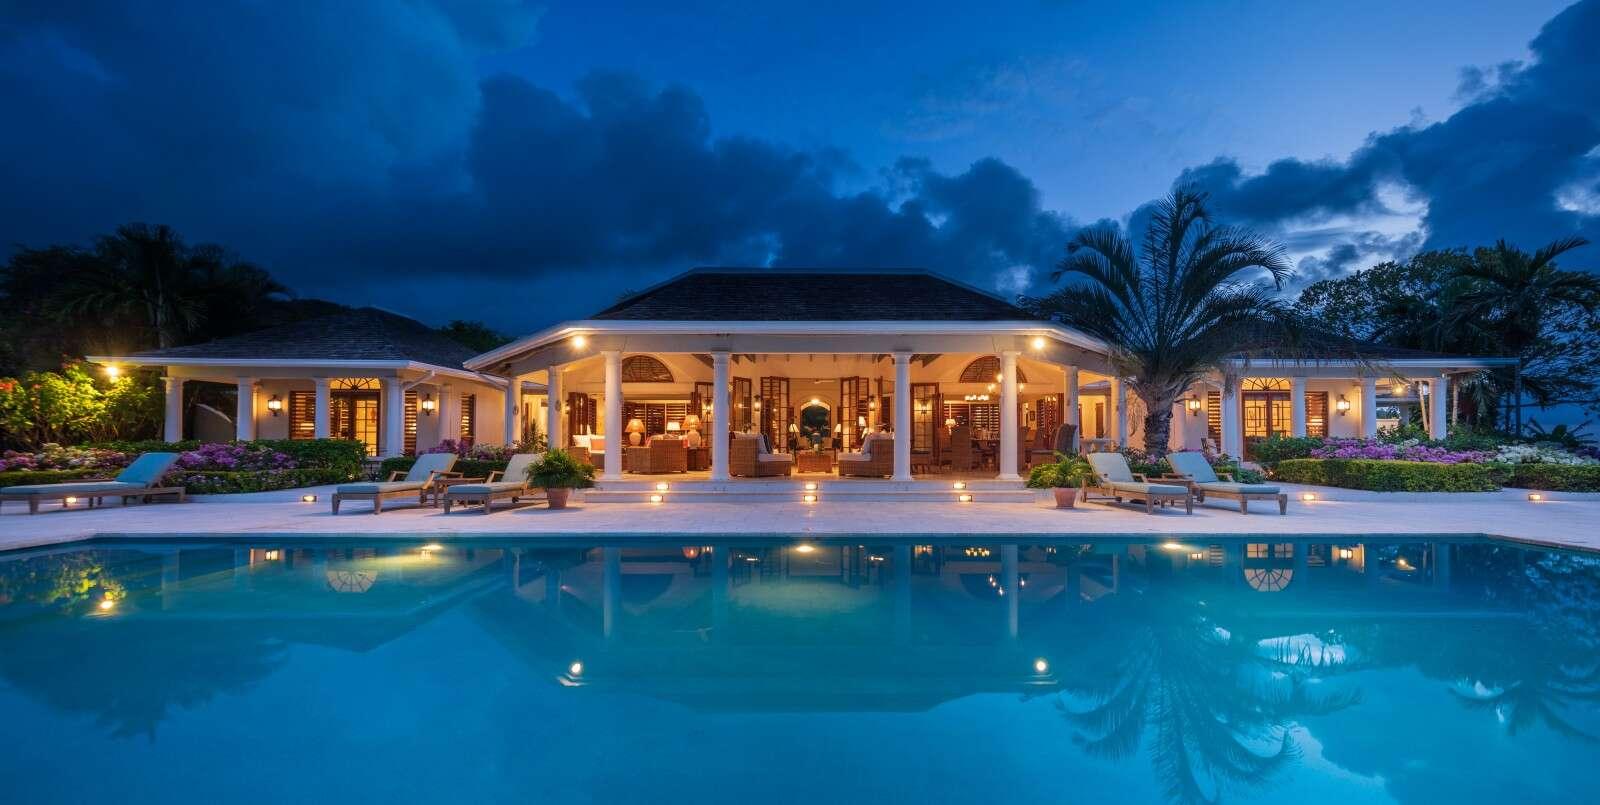 Luxury villa rentals caribbean - Jamaica - Try all club - Bougainvillea House - Image 1/14